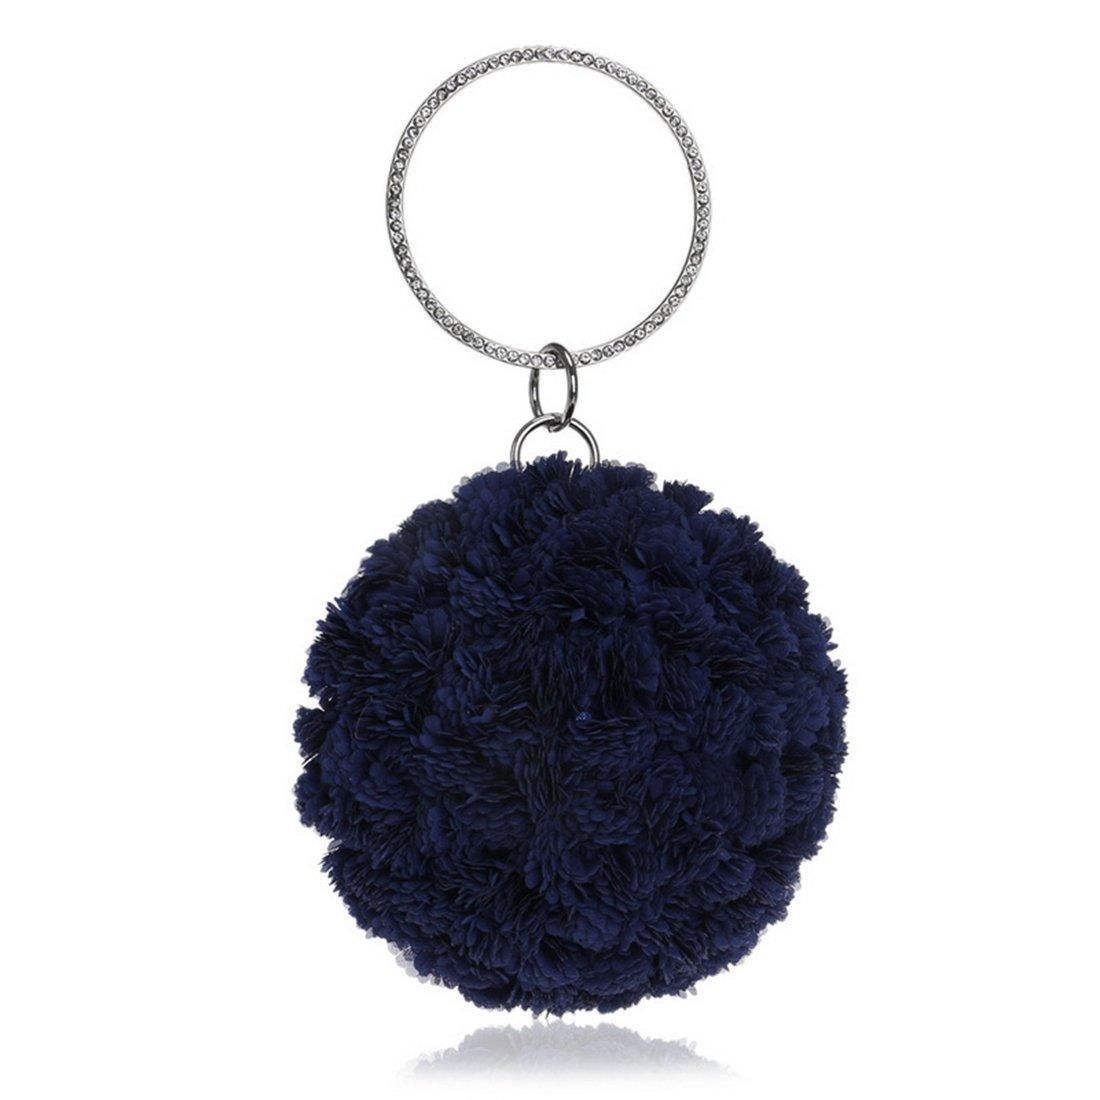 Color : Black QARYYQ European and American Foreign Trade Mobile Handbags Handmade Flowers Evening Bag Evening Package